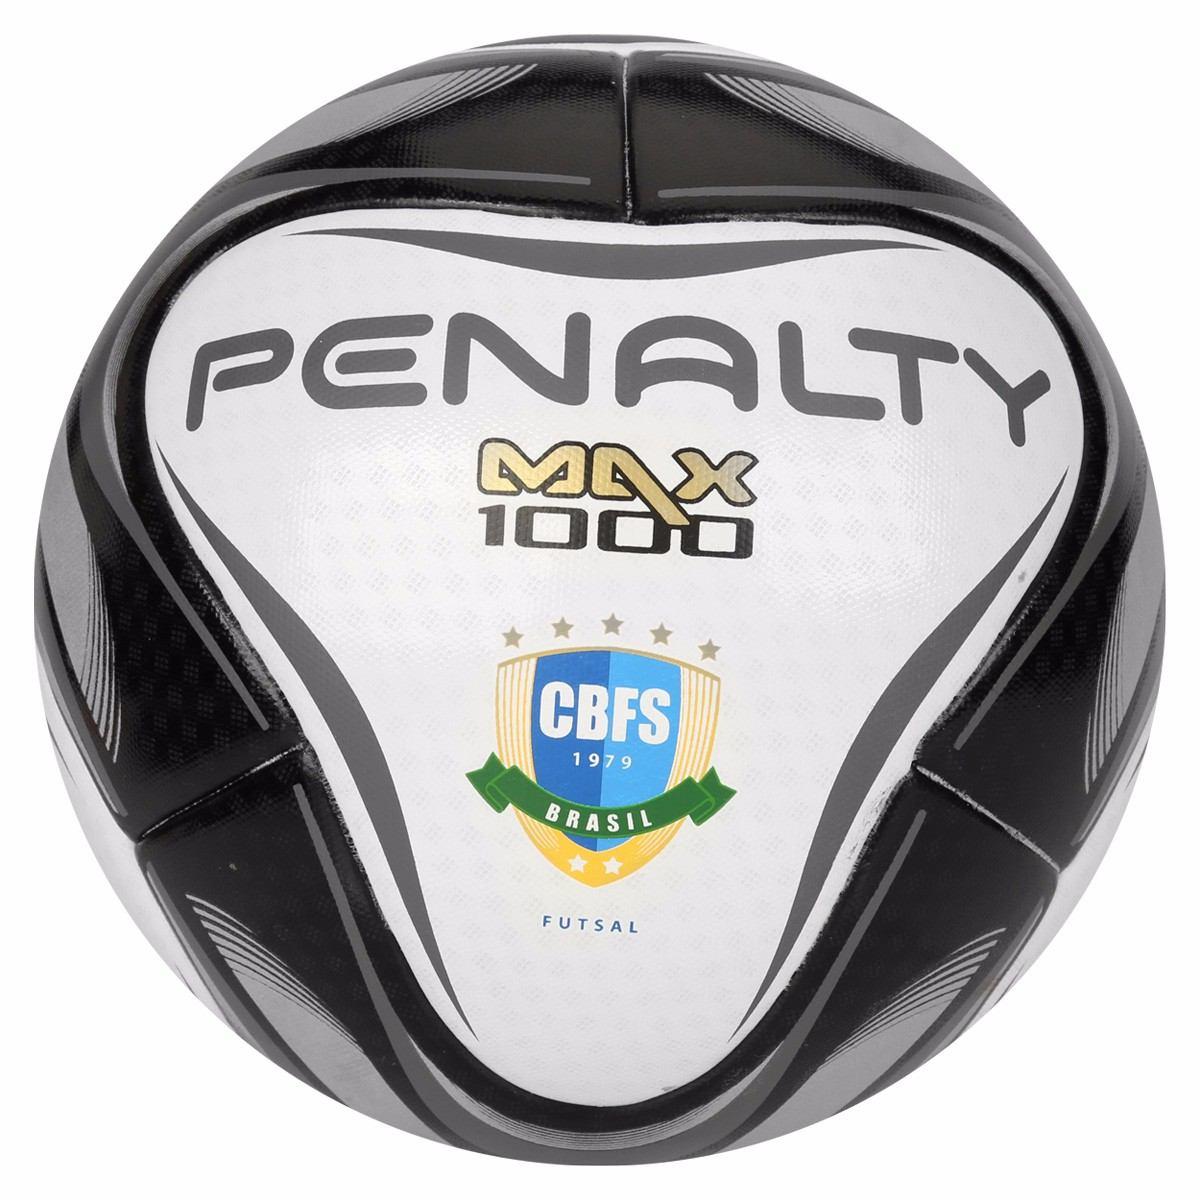 bola futsal penalty max 1000 pró aprovada pela cbfs !!!! Carregando zoom. 99e507f0086b8